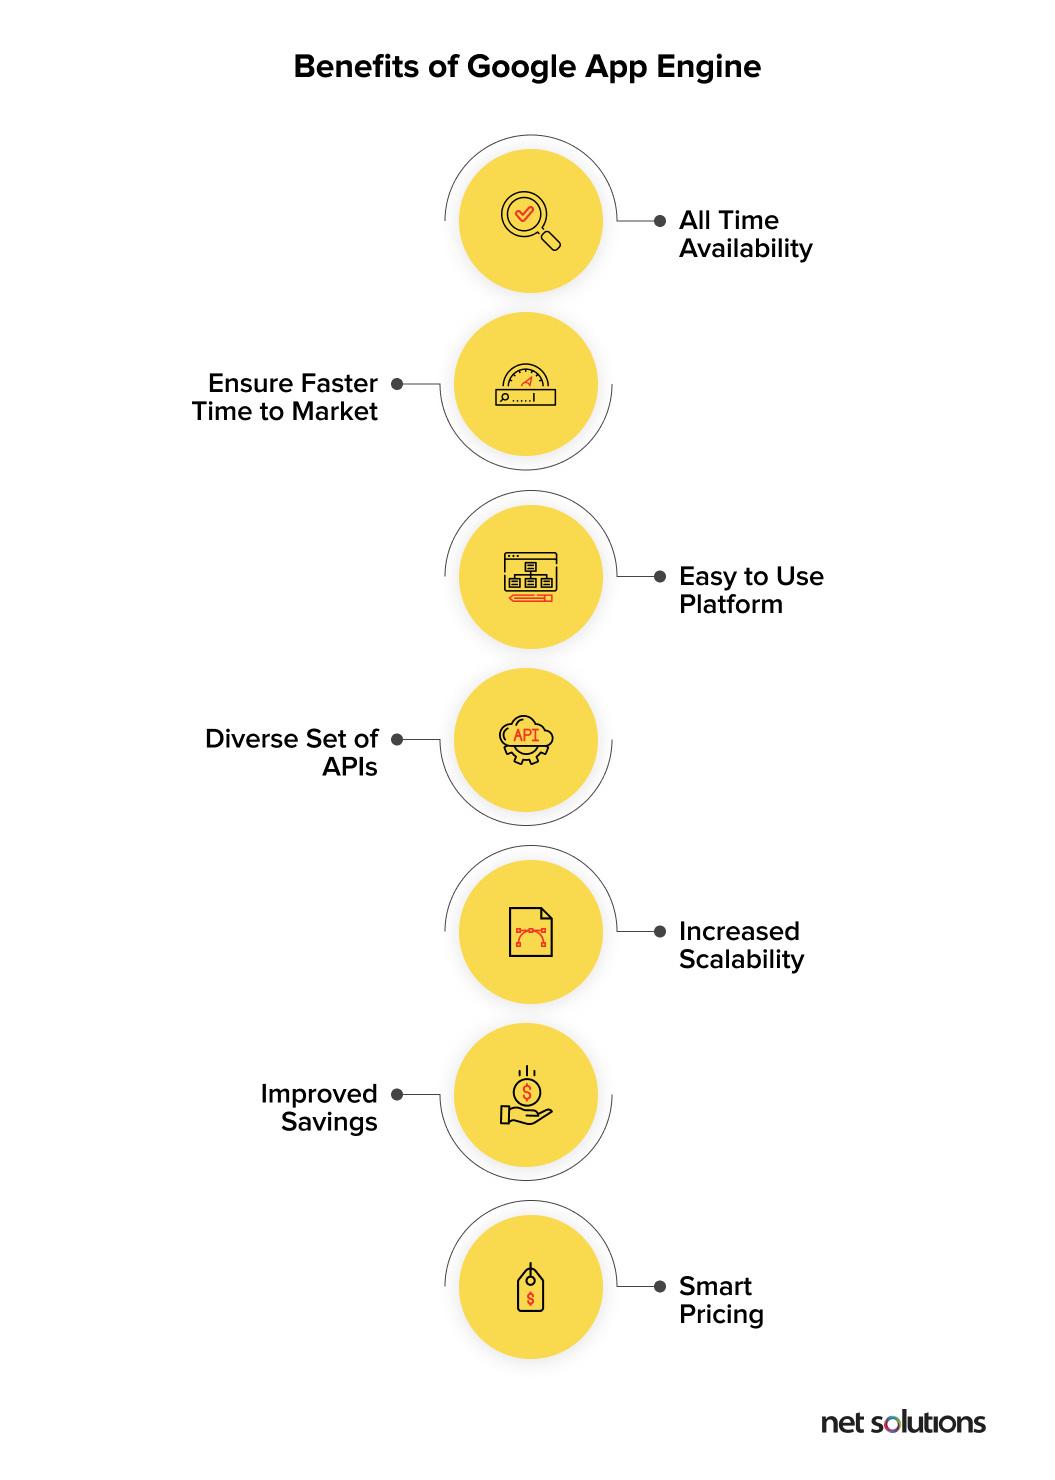 Benefits of Google App Engine | Google App Engine